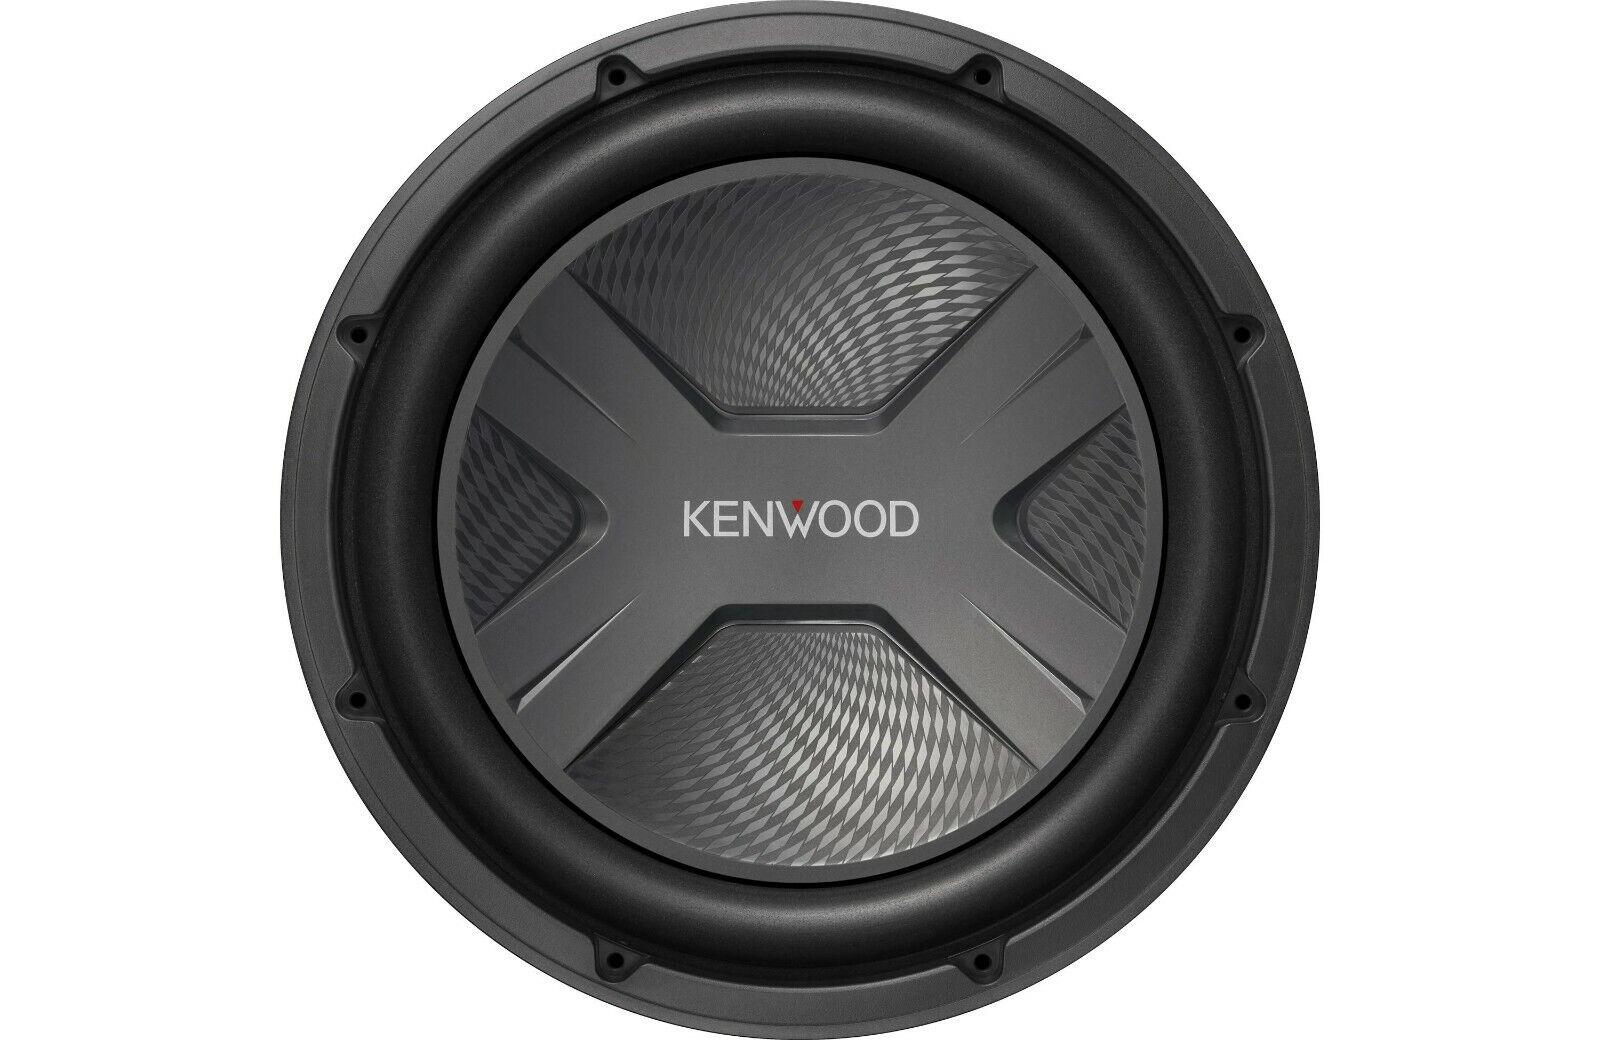 "Kenwood - 12"" 4-ohm Subwoofer - Silver"